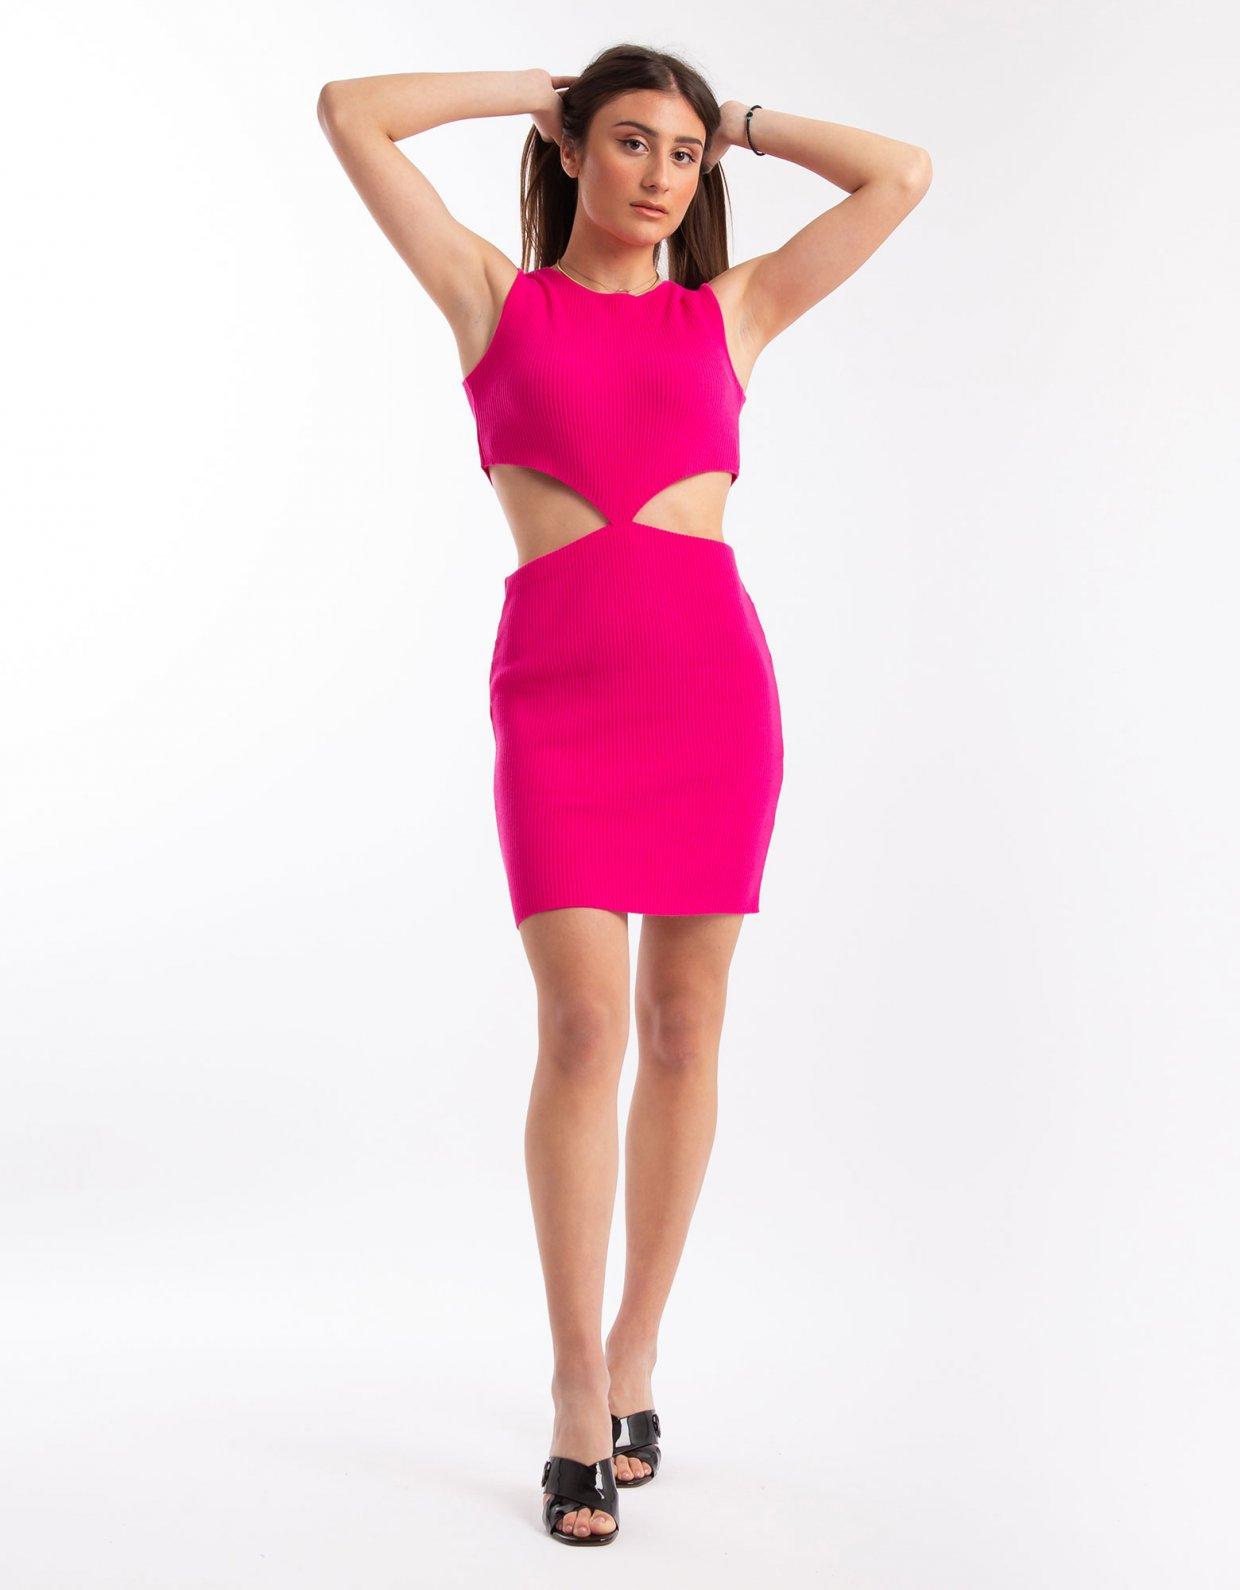 Combos Knitwear Combos S20 – Fuchsia mini dress